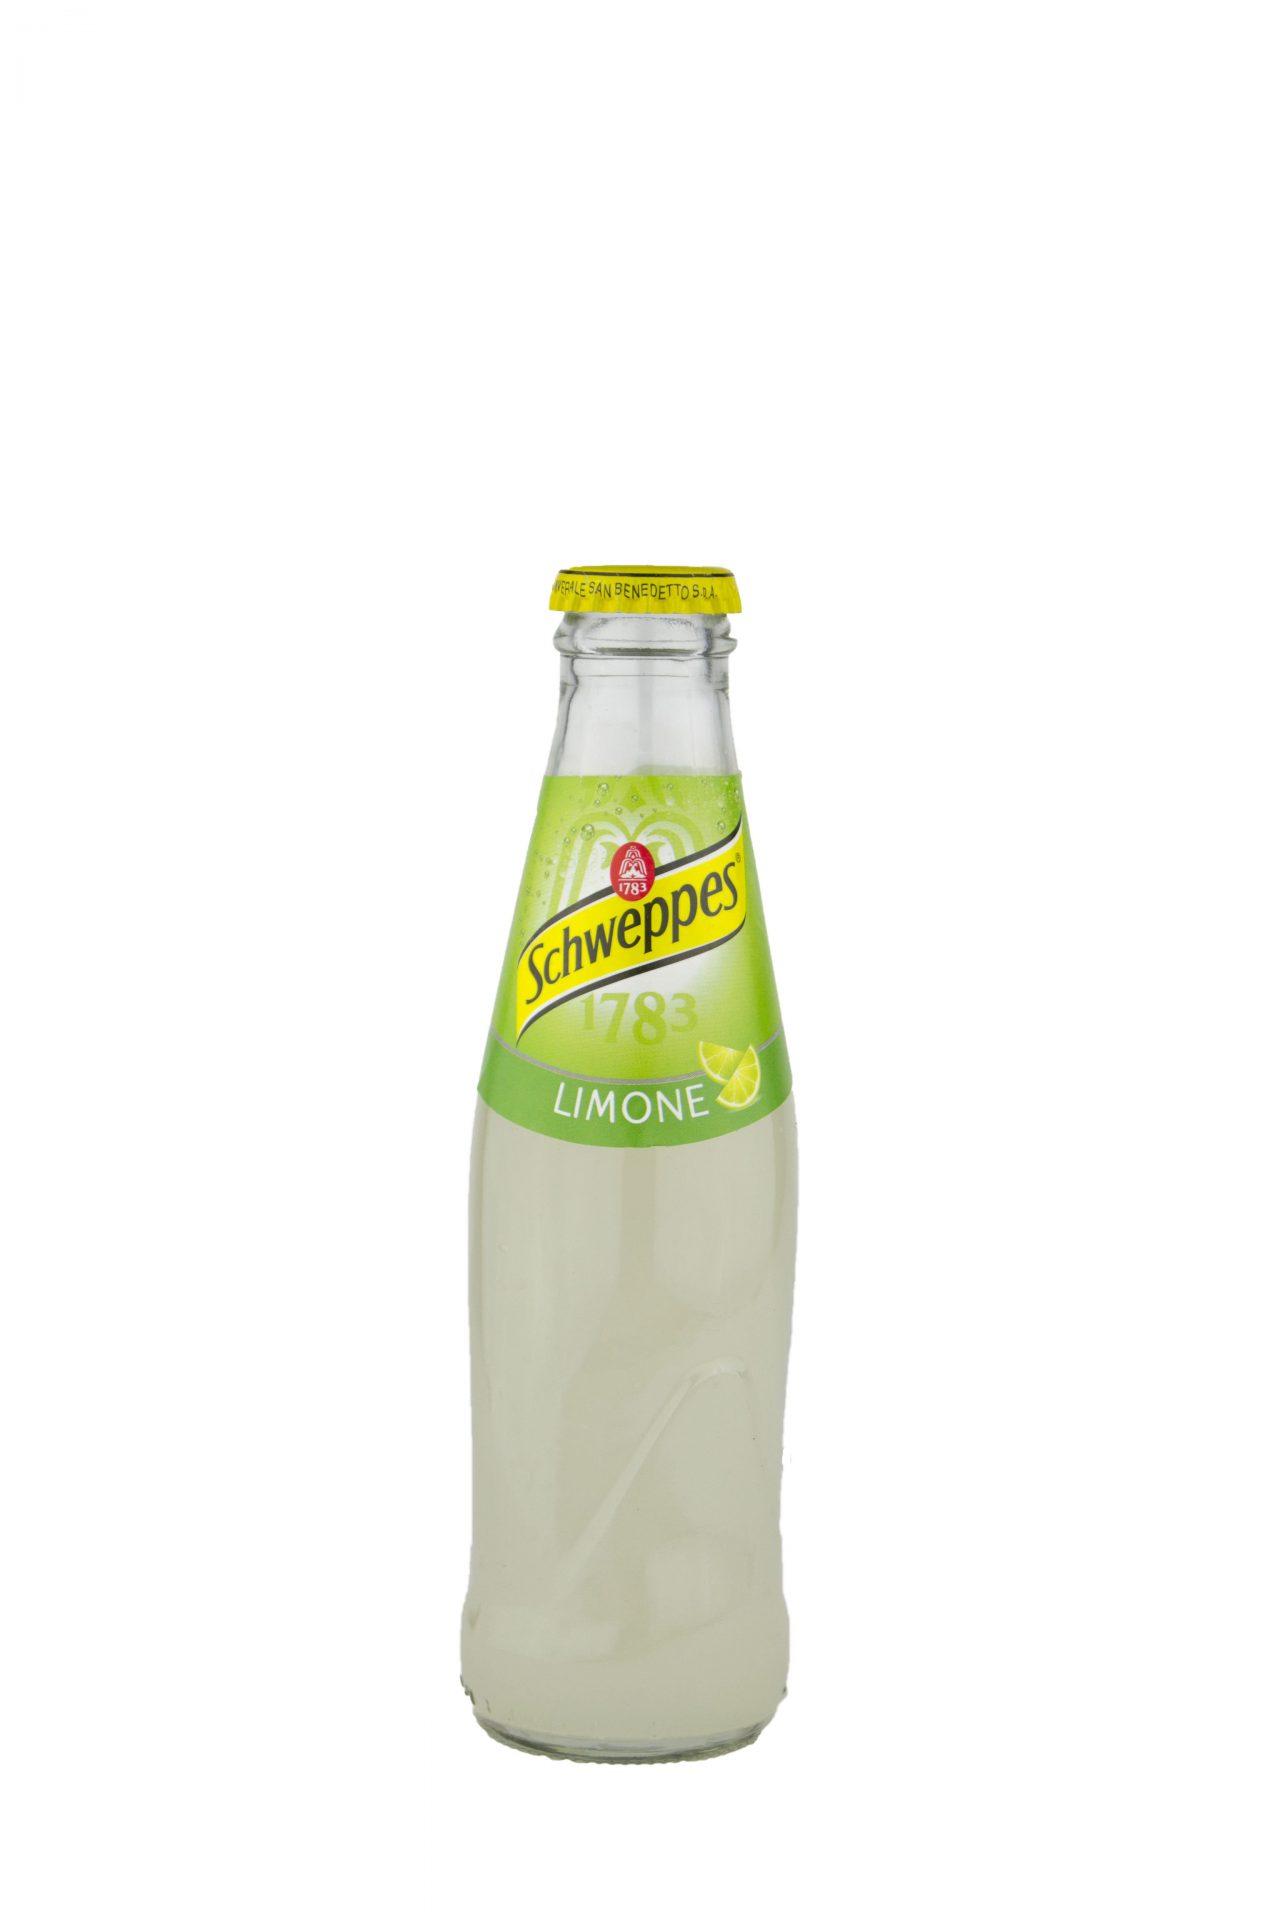 Schweppes – Limone